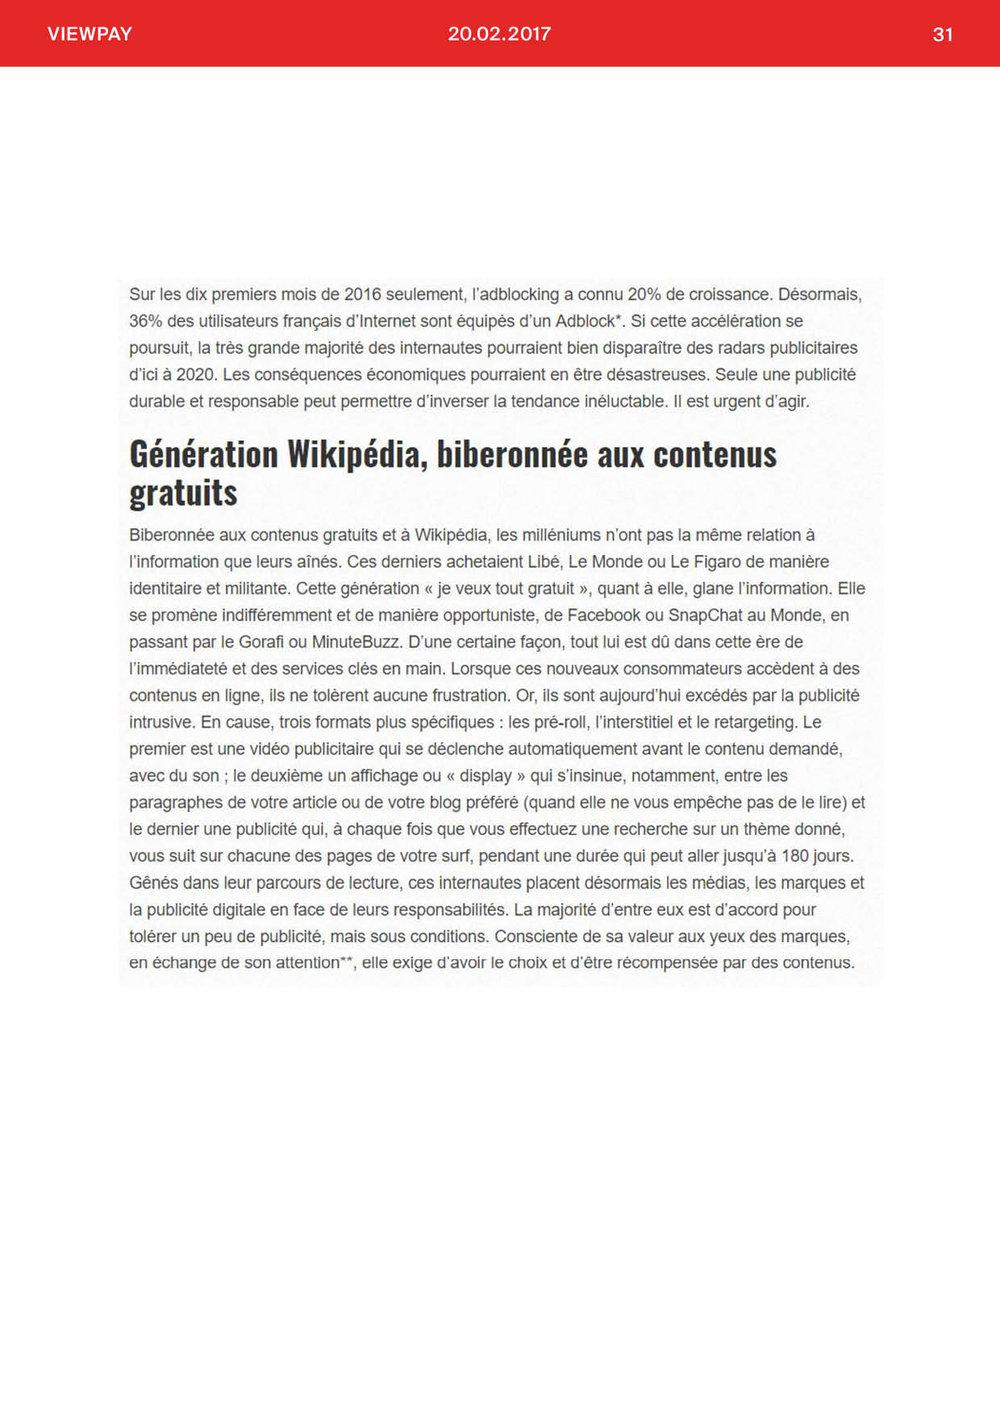 BOOKMEDIA_FEV31.jpg